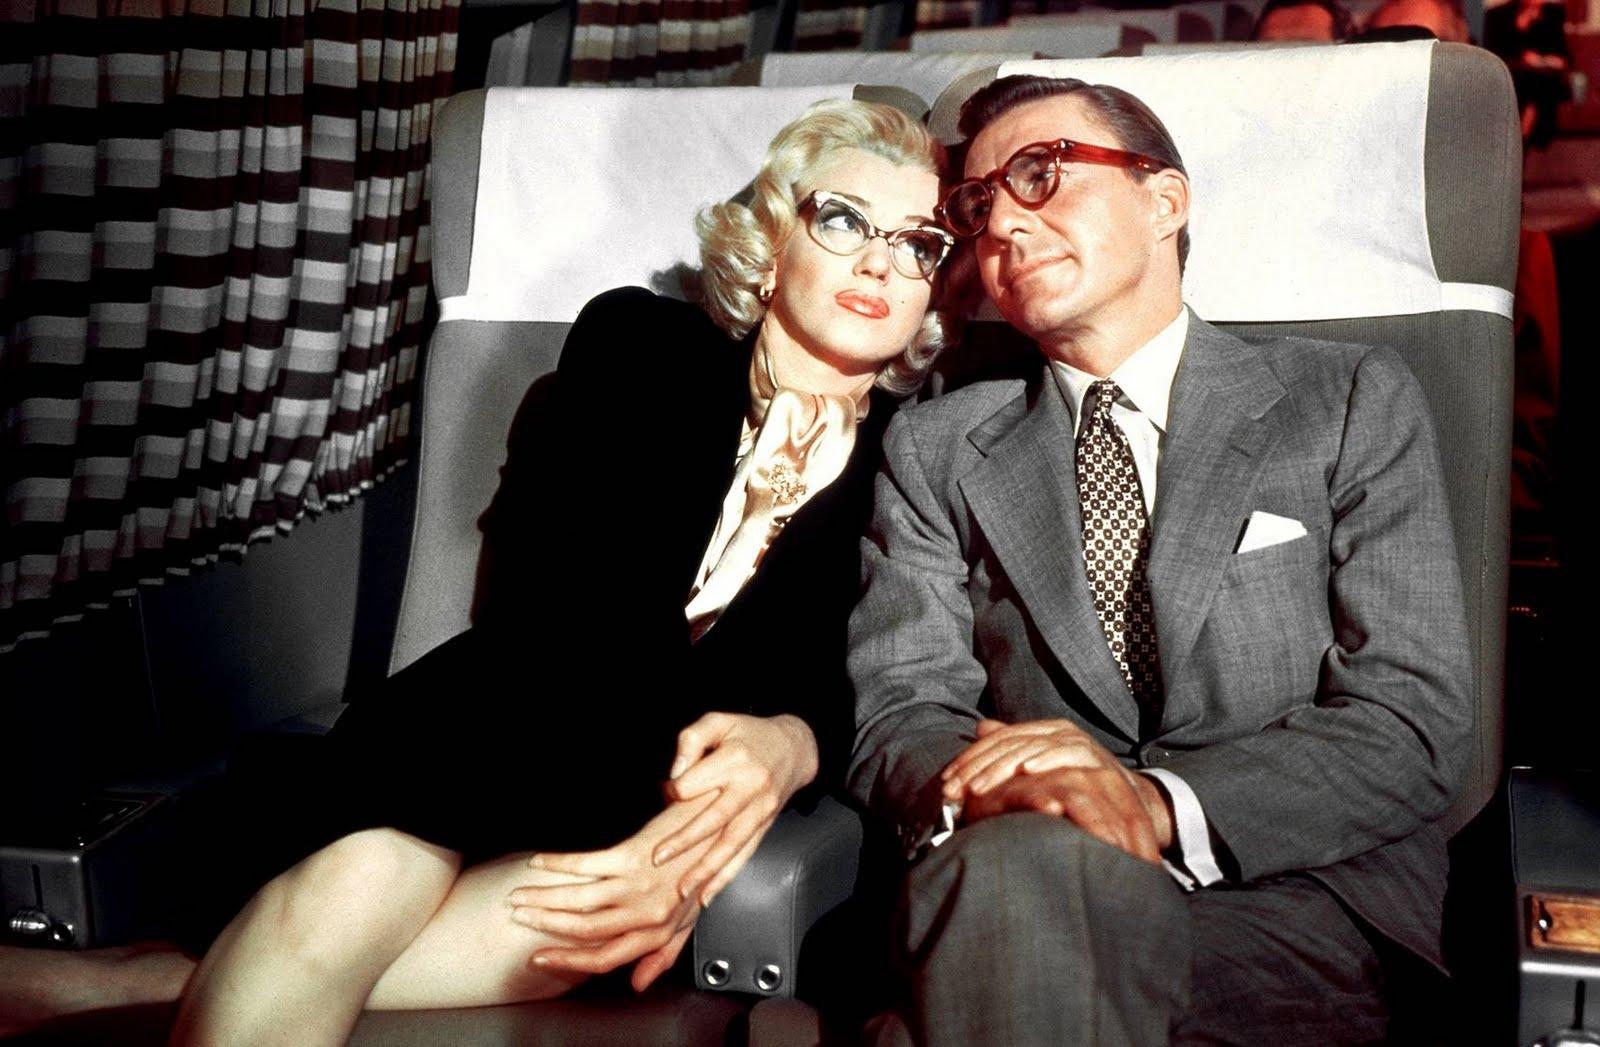 http://2.bp.blogspot.com/_fqqHBQnIOHE/TTRMcQwKQ6I/AAAAAAAAADo/K0NKz0JNts8/s1600/Annex+-+Monroe%252C+Marilyn+%2528How+to+Marry+a+Millionaire%2529_04.jpg